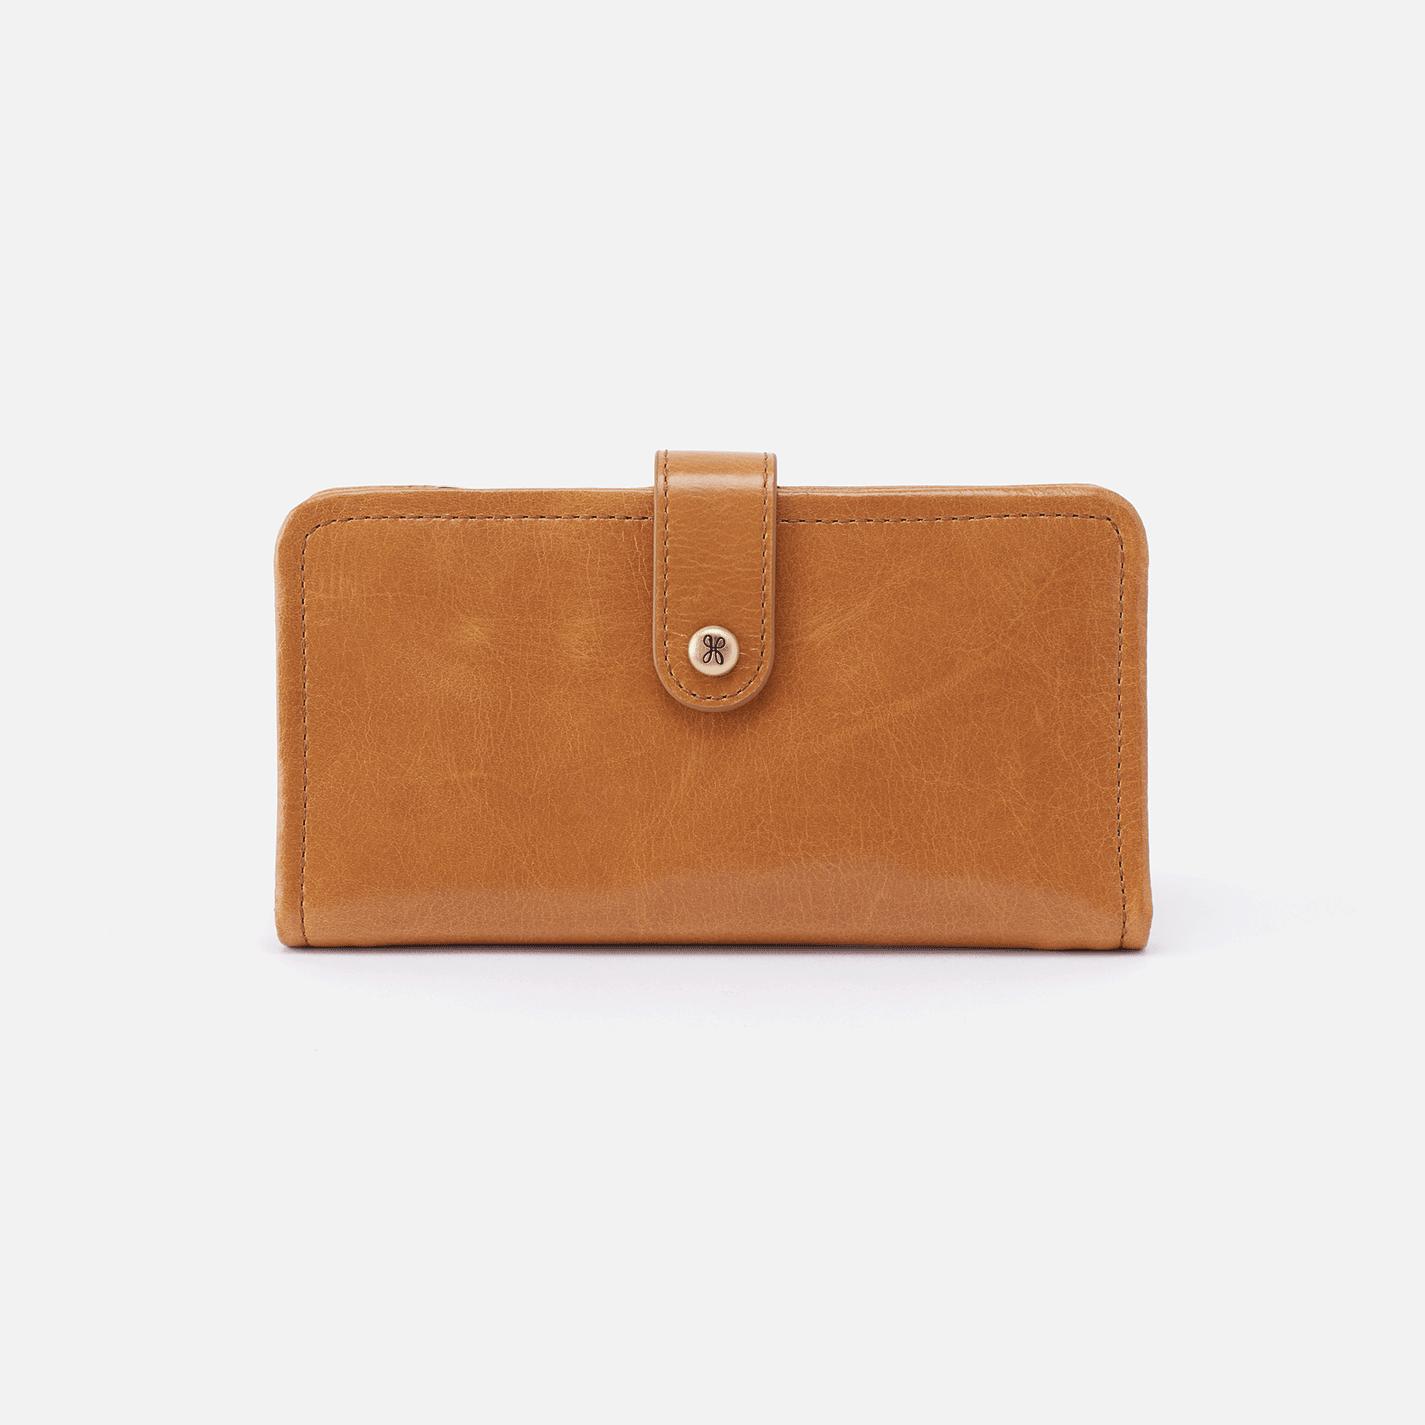 Hobo TORCH Wallet